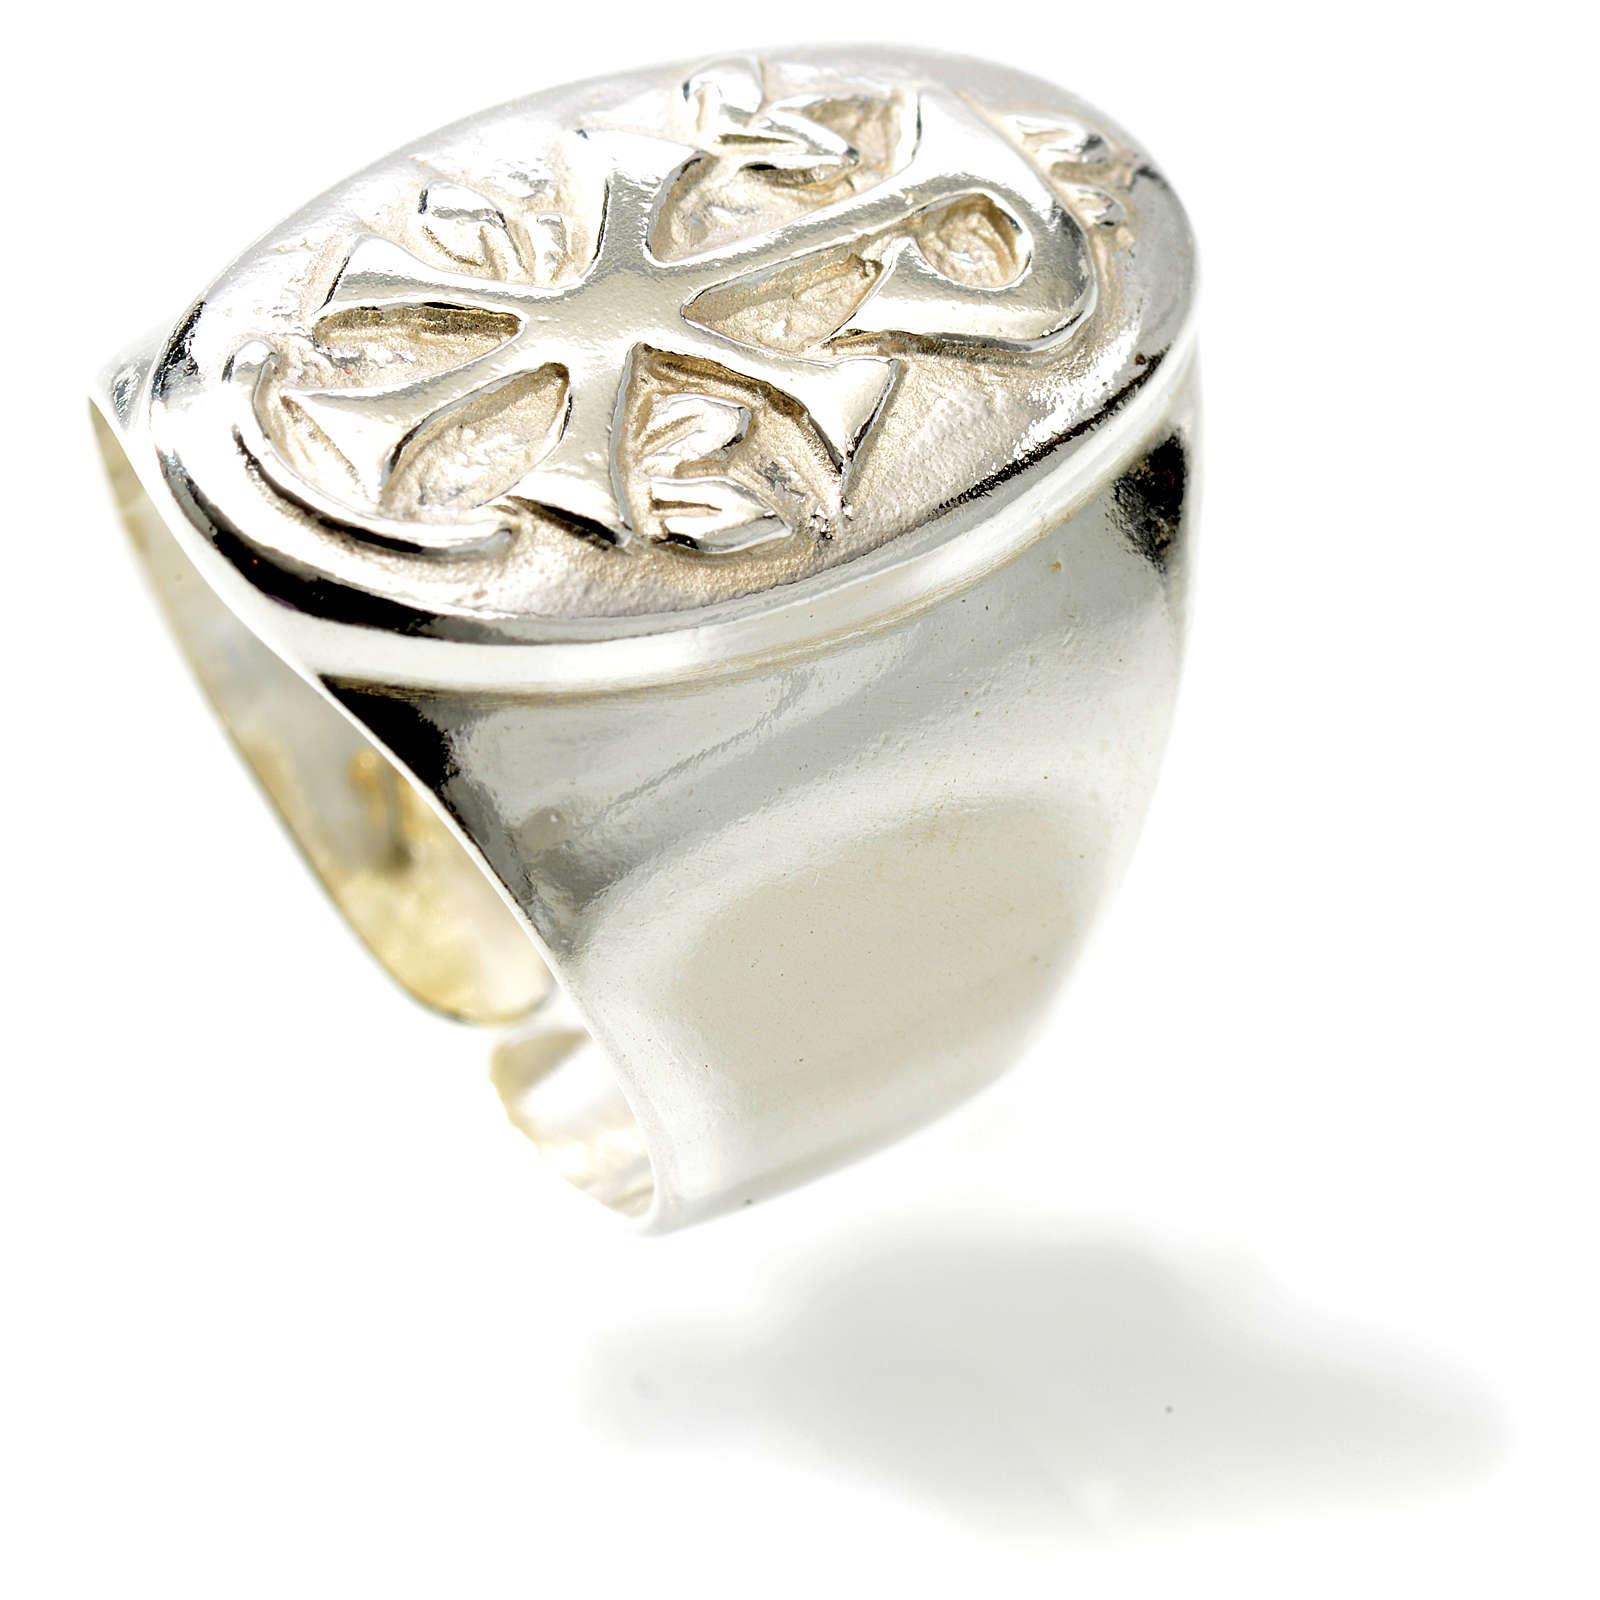 Chi-Rho silver ring 3